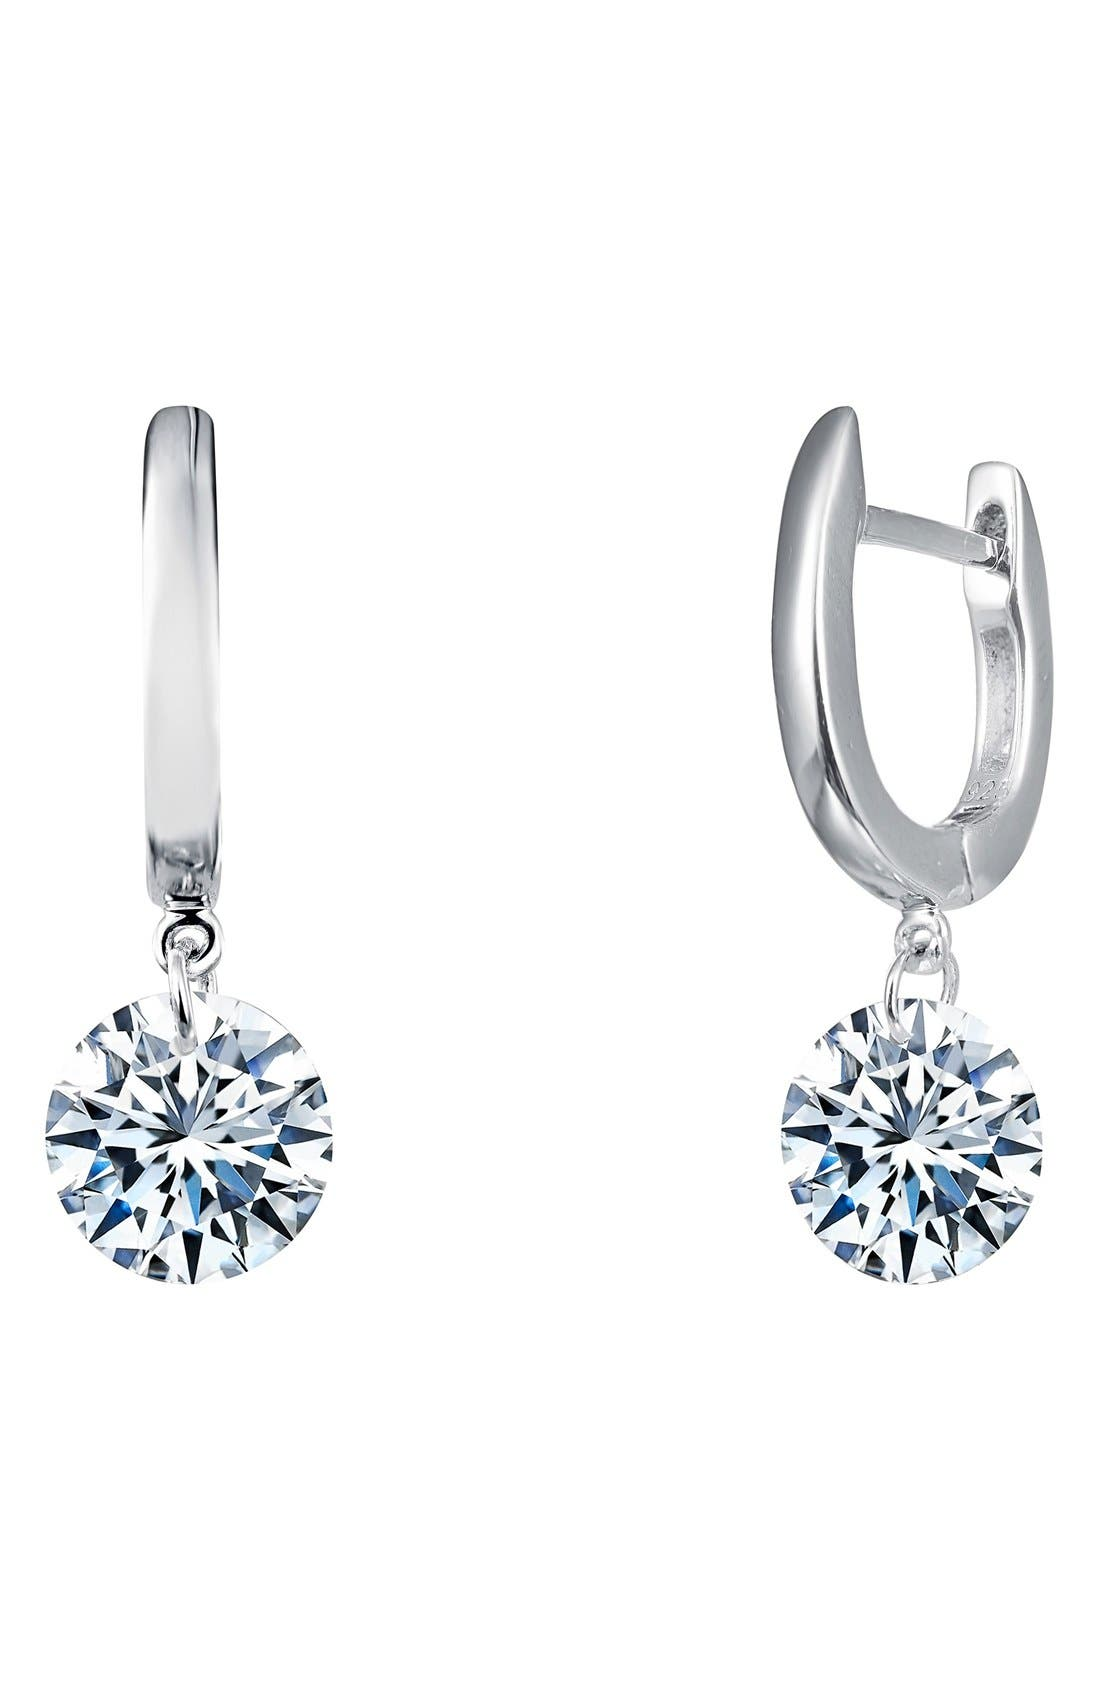 In Motion Drop Earrings,                         Main,                         color, Silver